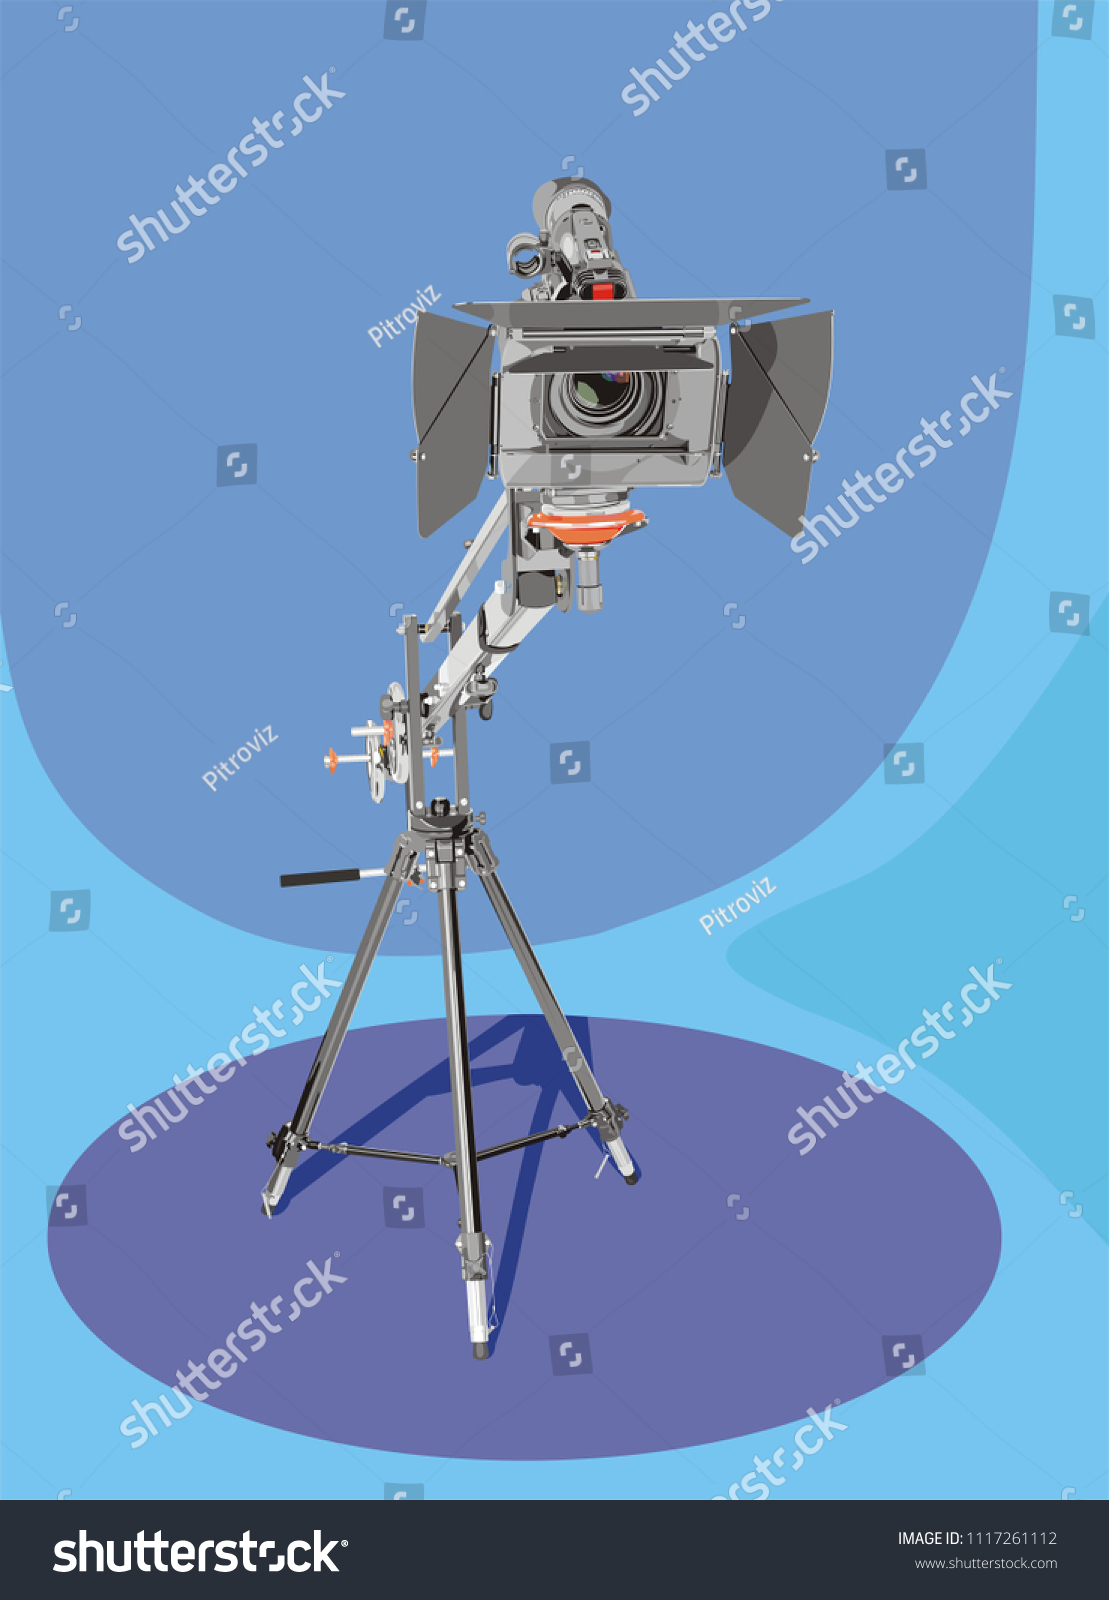 art illustration high definition camcorder on stock illustration